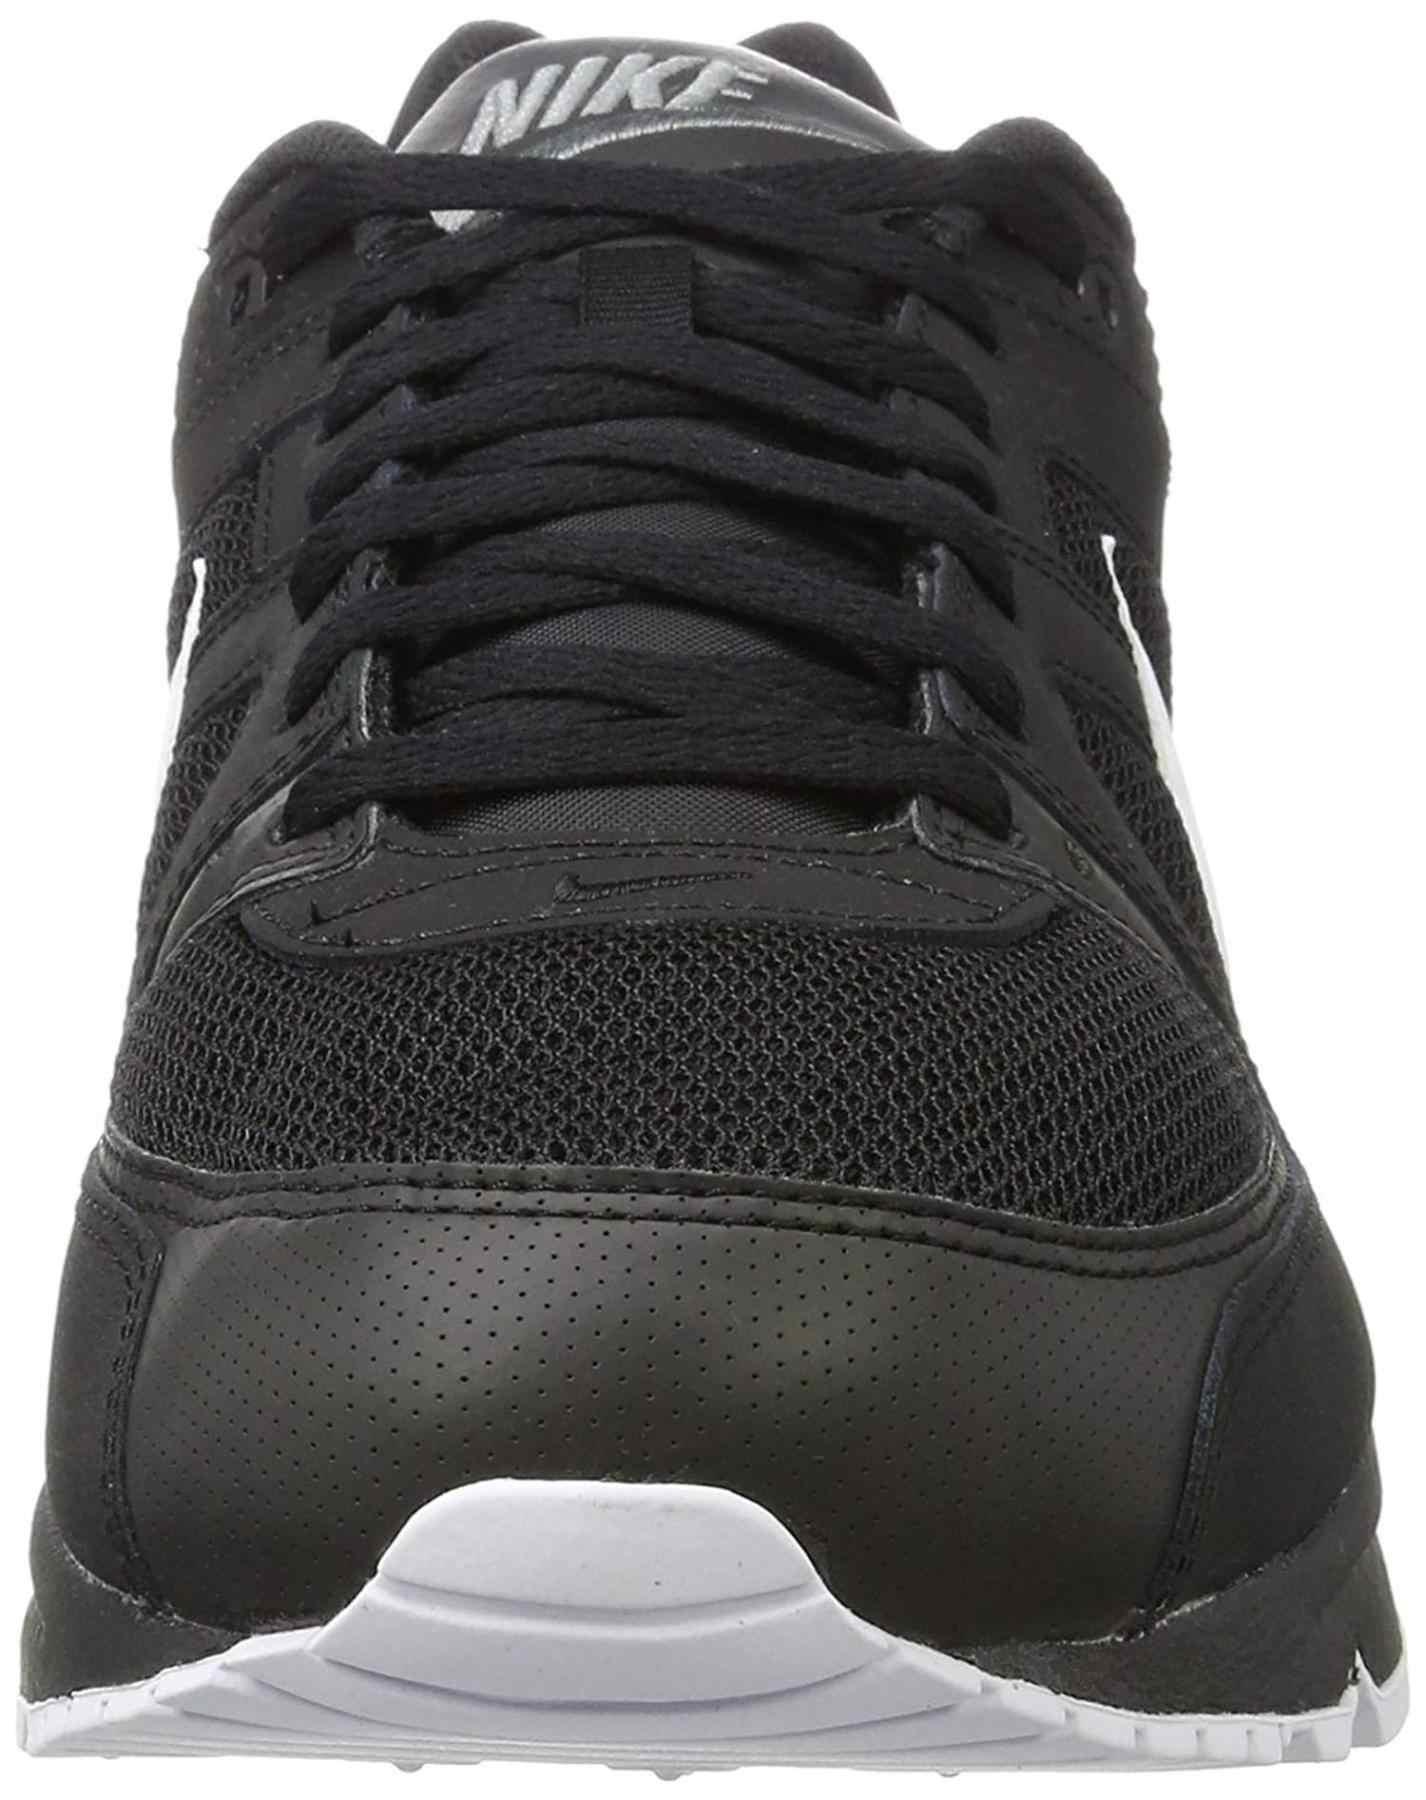 air max hombre zapatillas negras